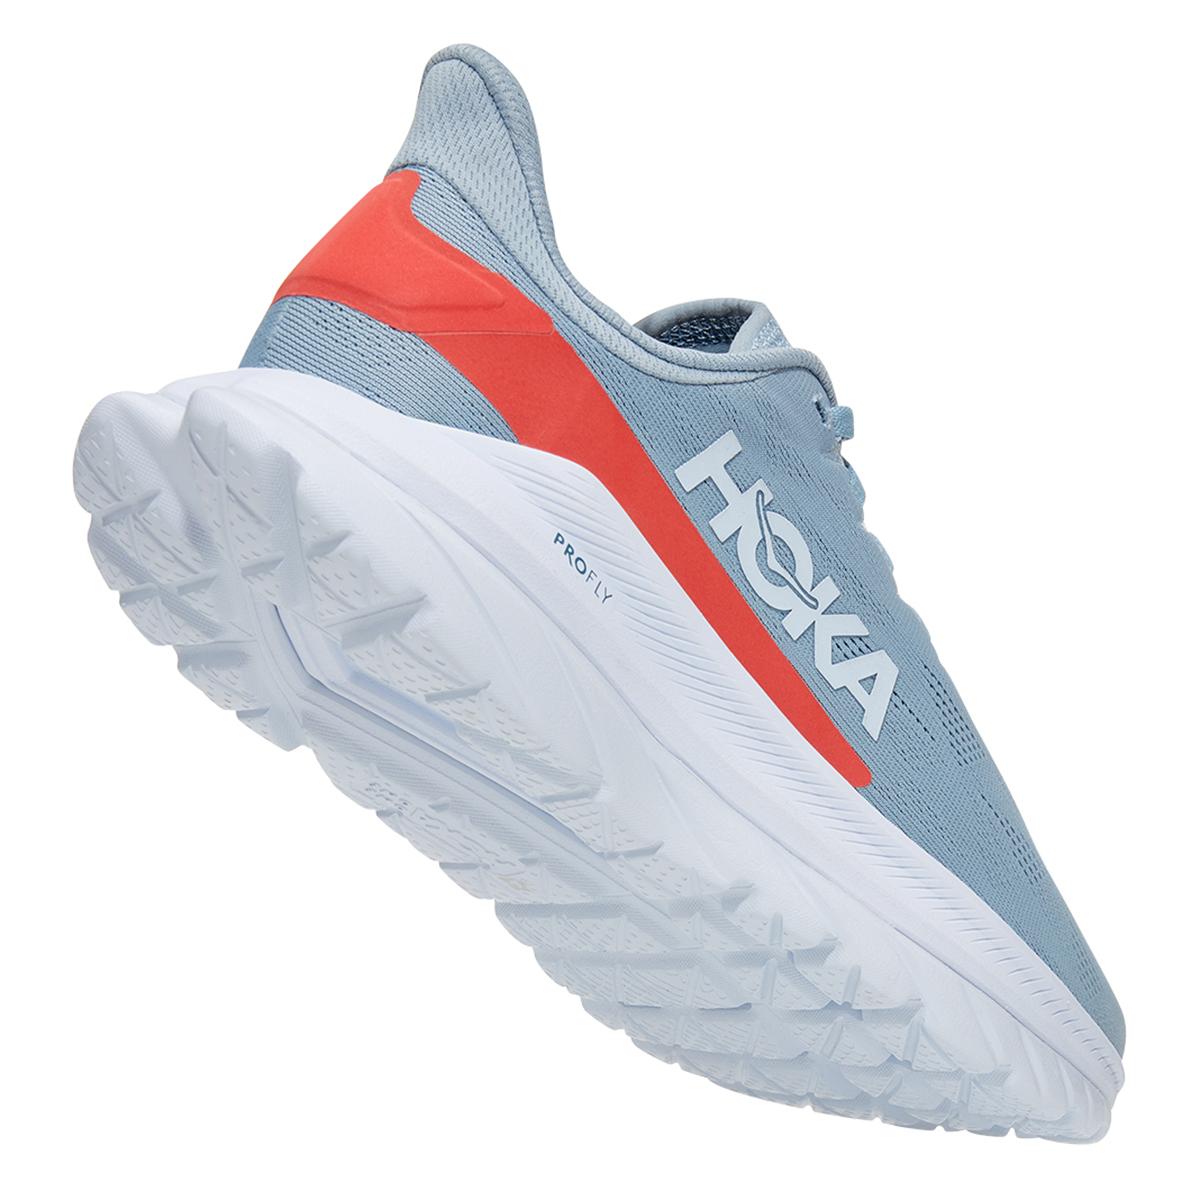 Women's Hoka One One Mach 4 Running Shoe - Color: Blue Fog/Hot Coral - Size: 5 - Width: Regular, Blue Fog/Hot Coral, large, image 5